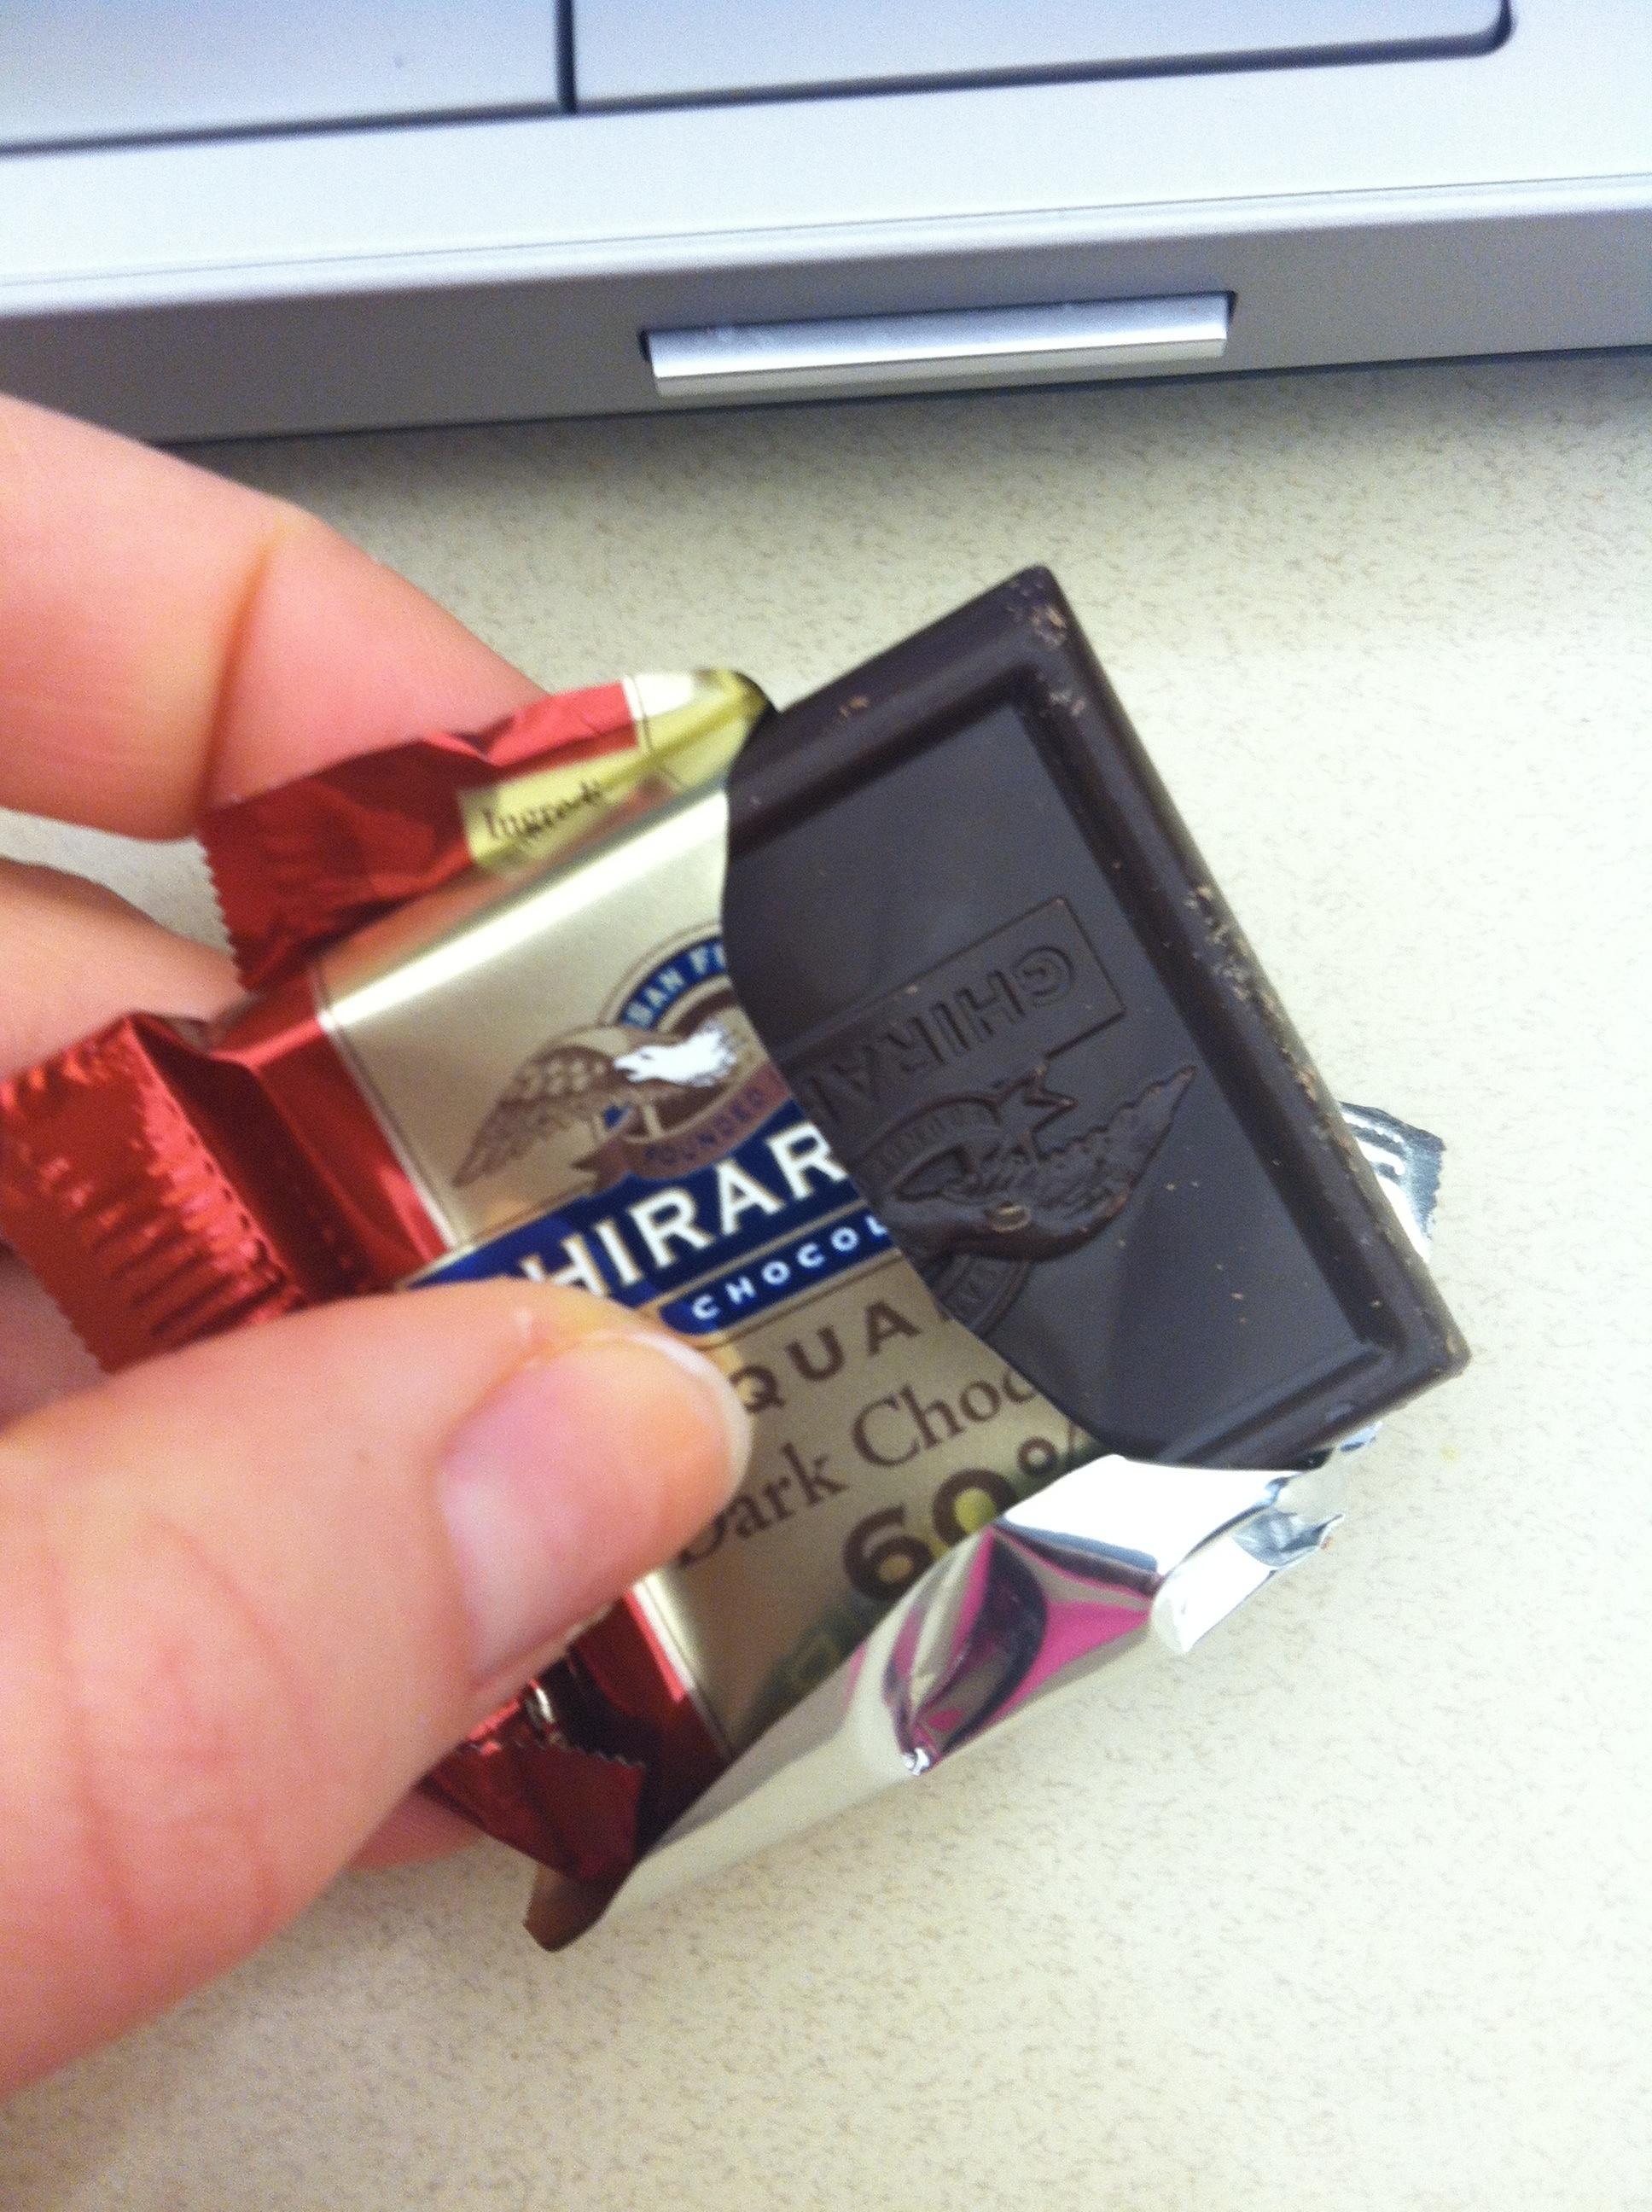 Ghirardelli Chocolate at work